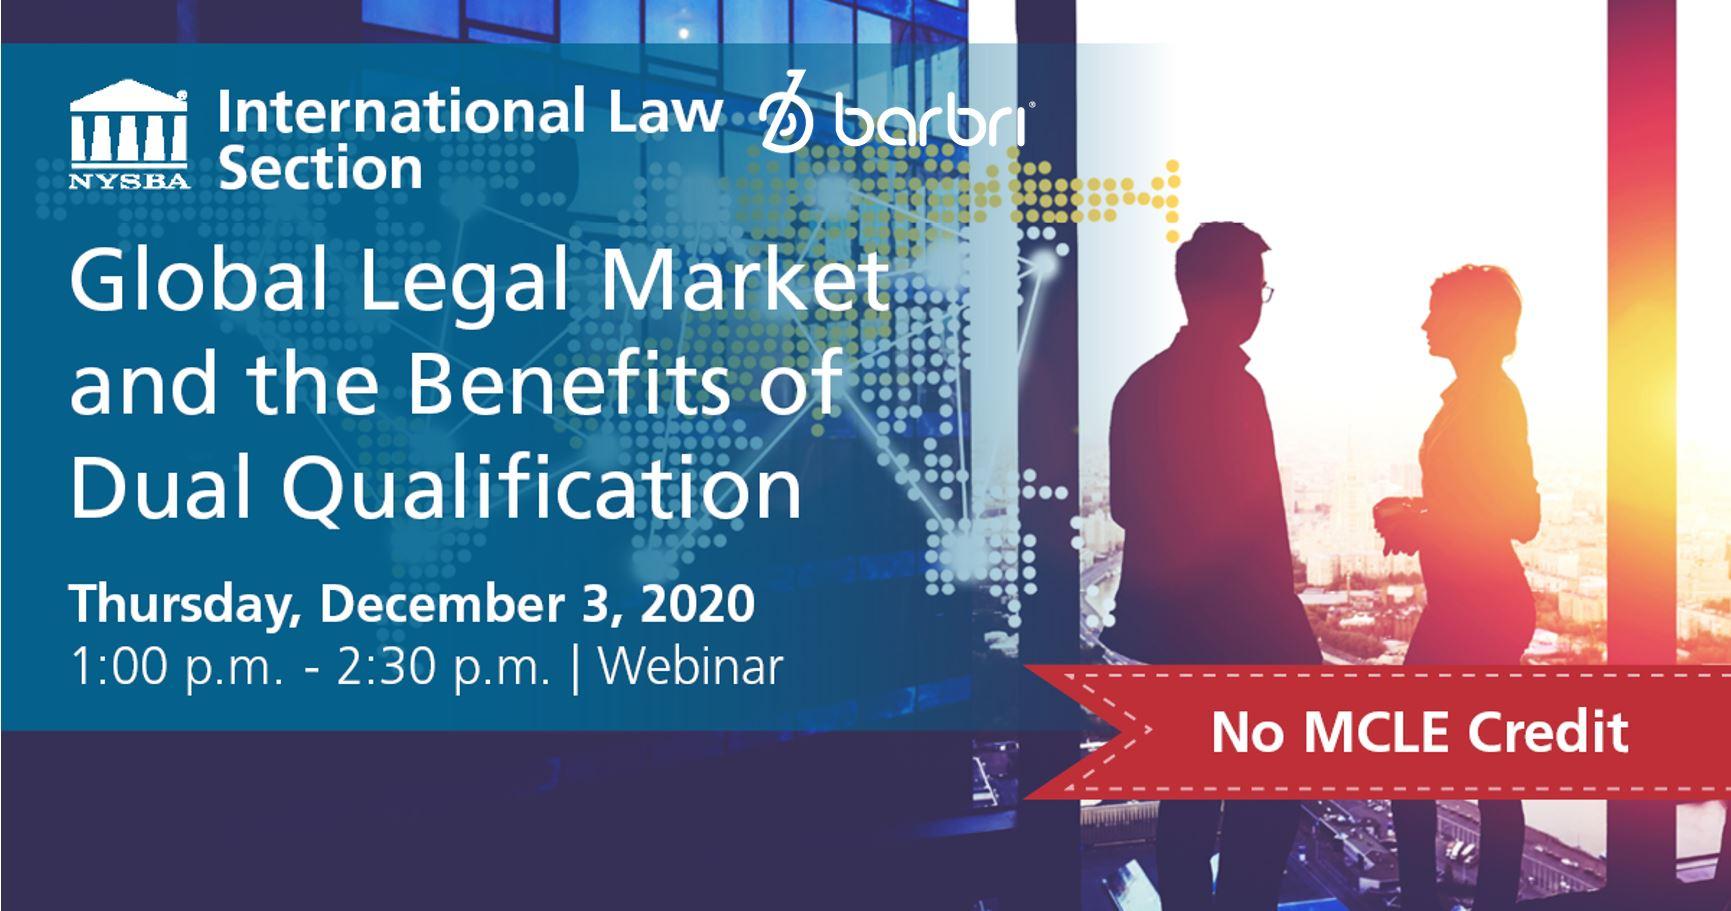 Barbri Global Legal Markets